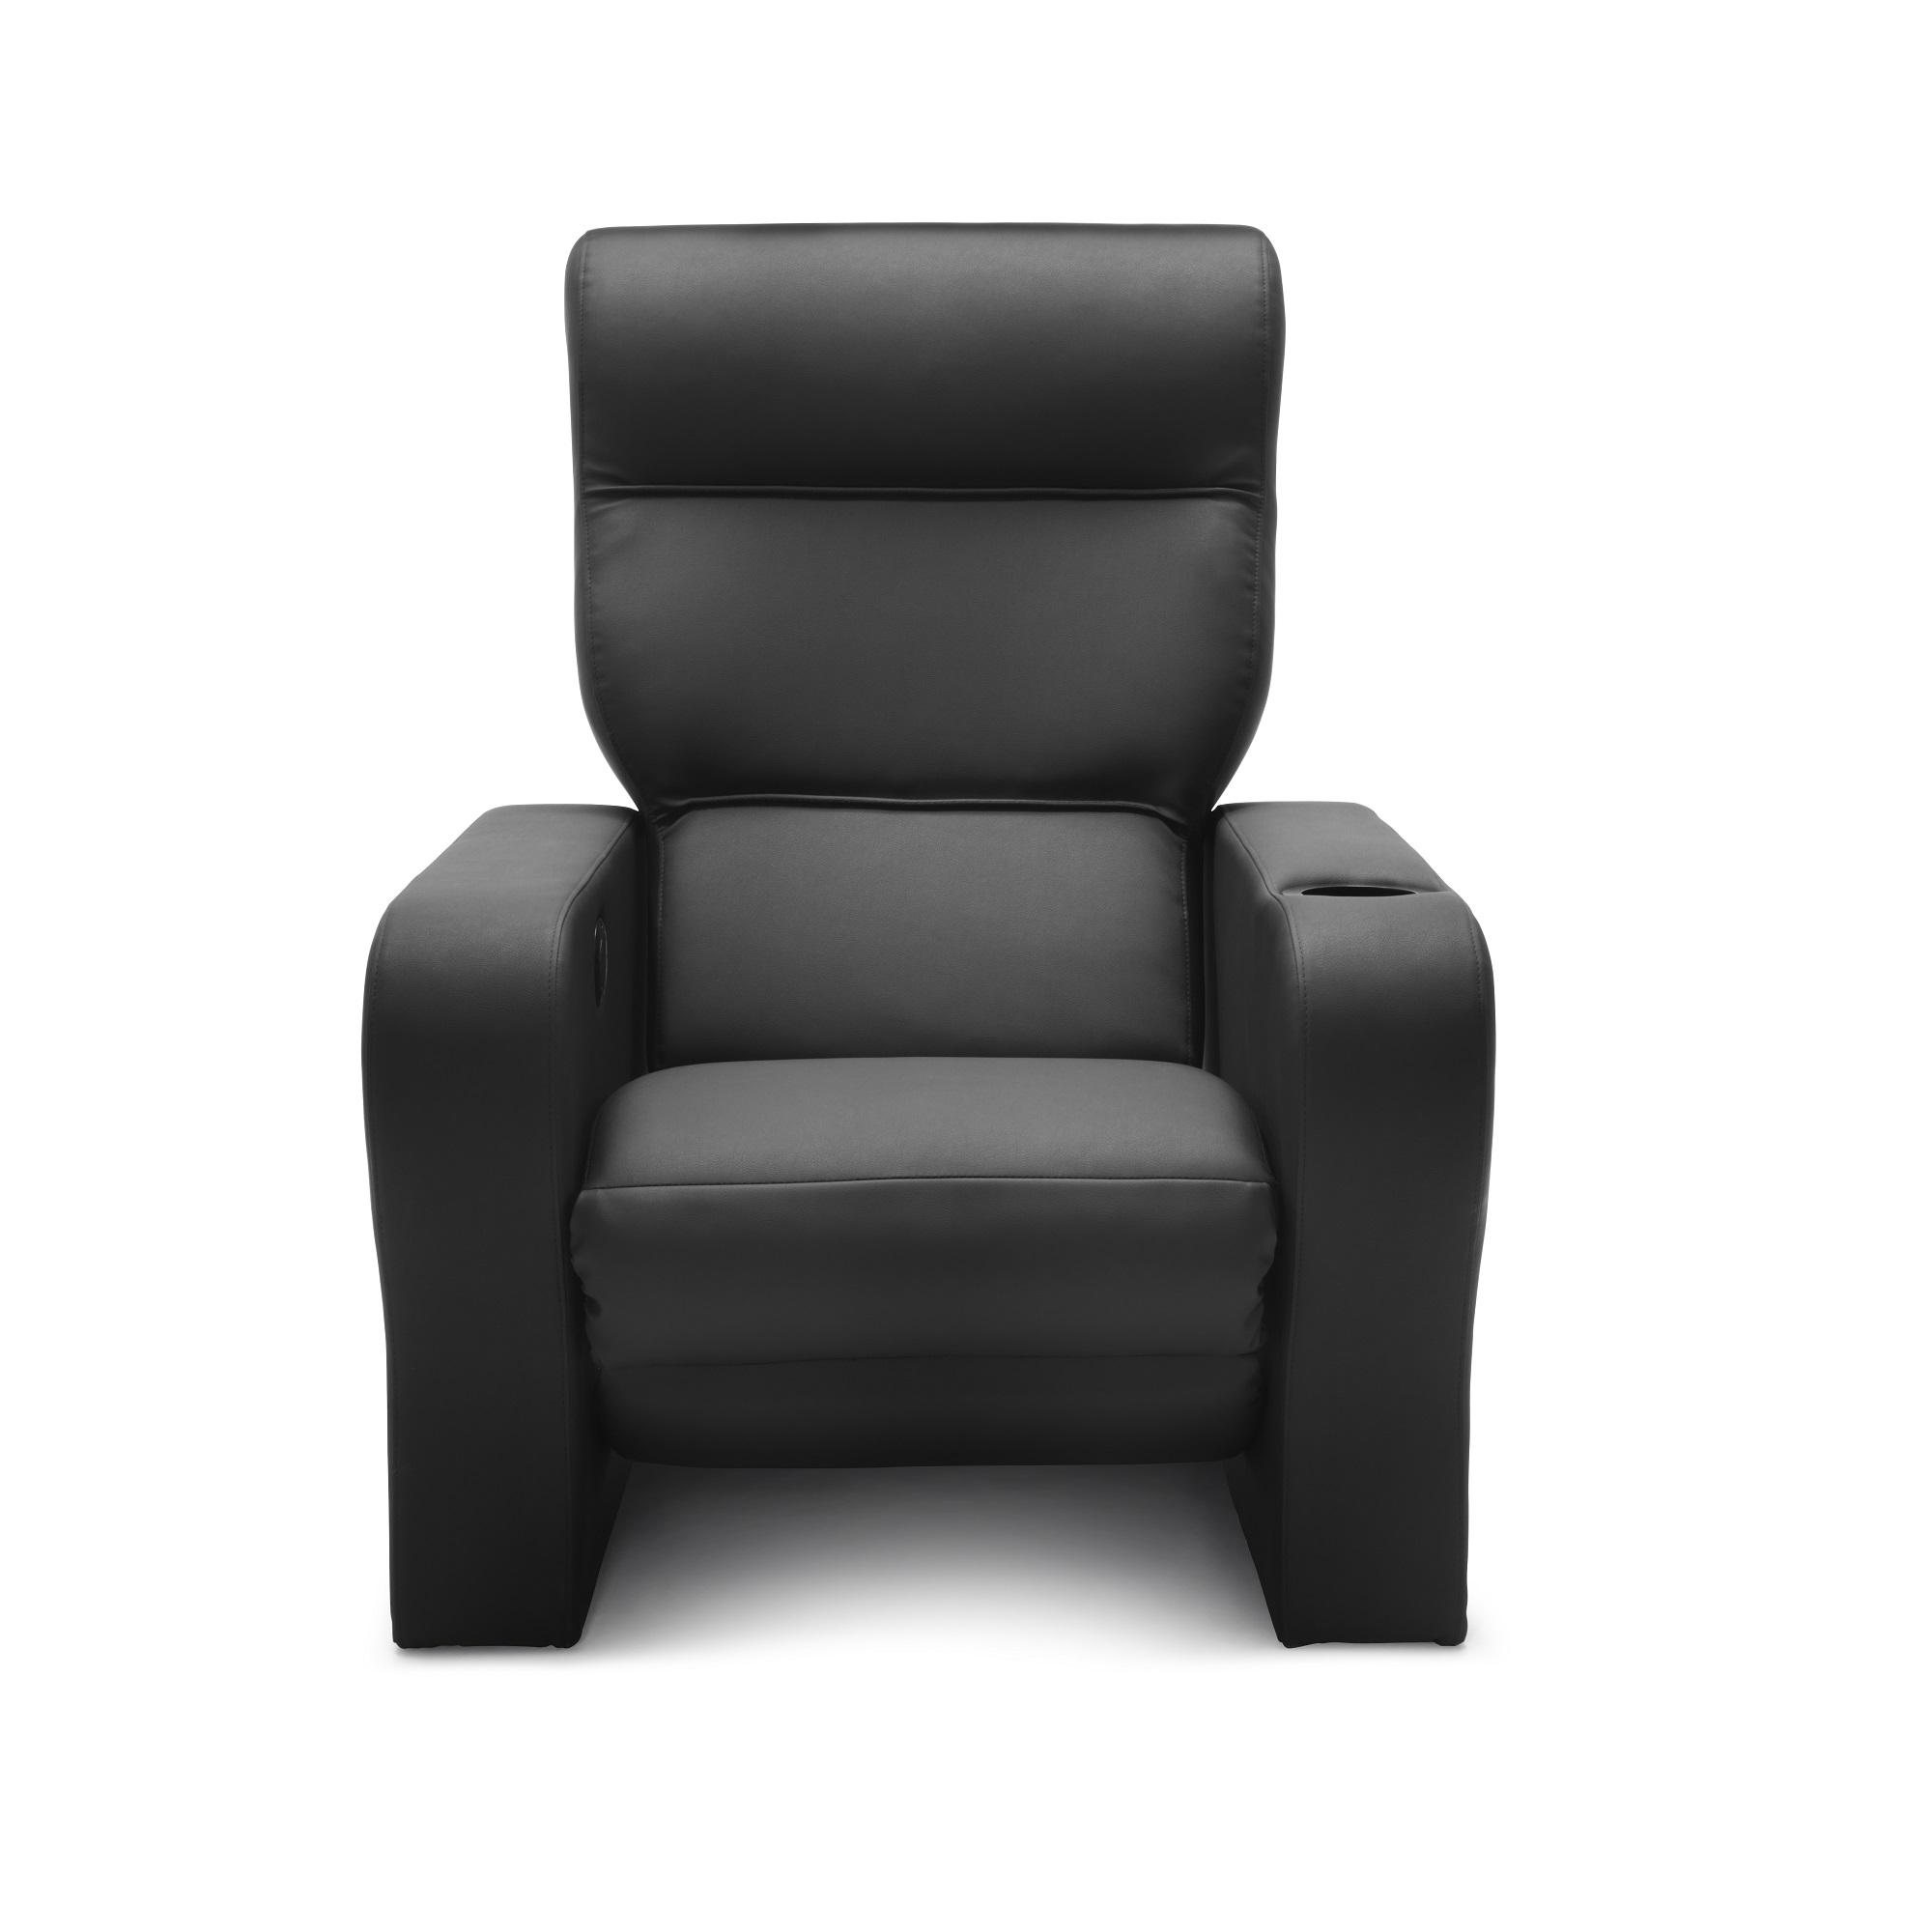 designer seating - my cinema uk